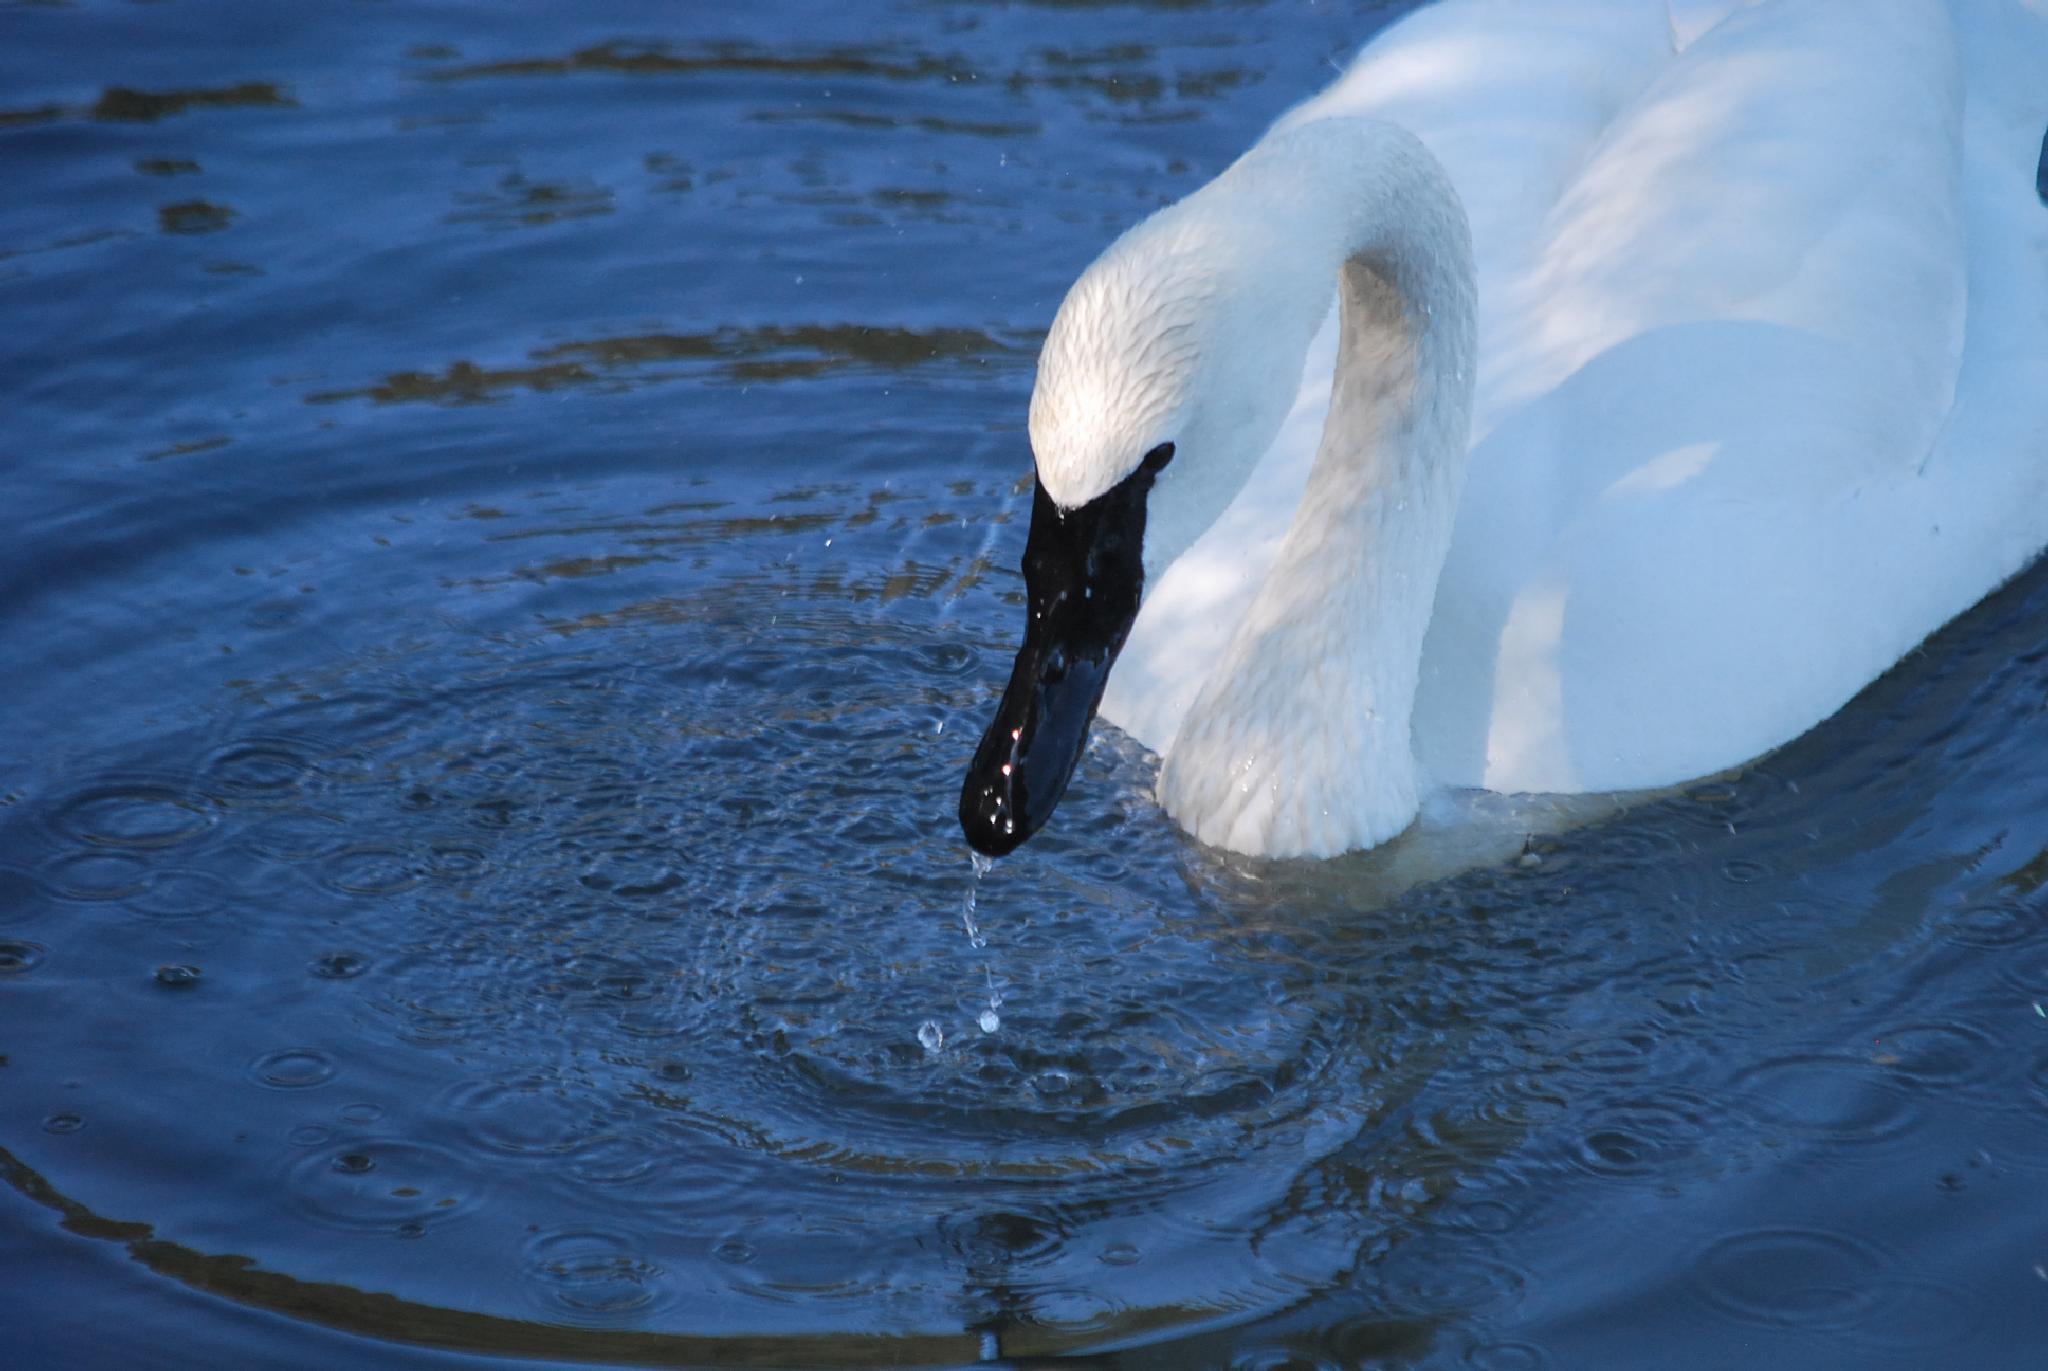 Water dripping off the beak by marilyn wirtz